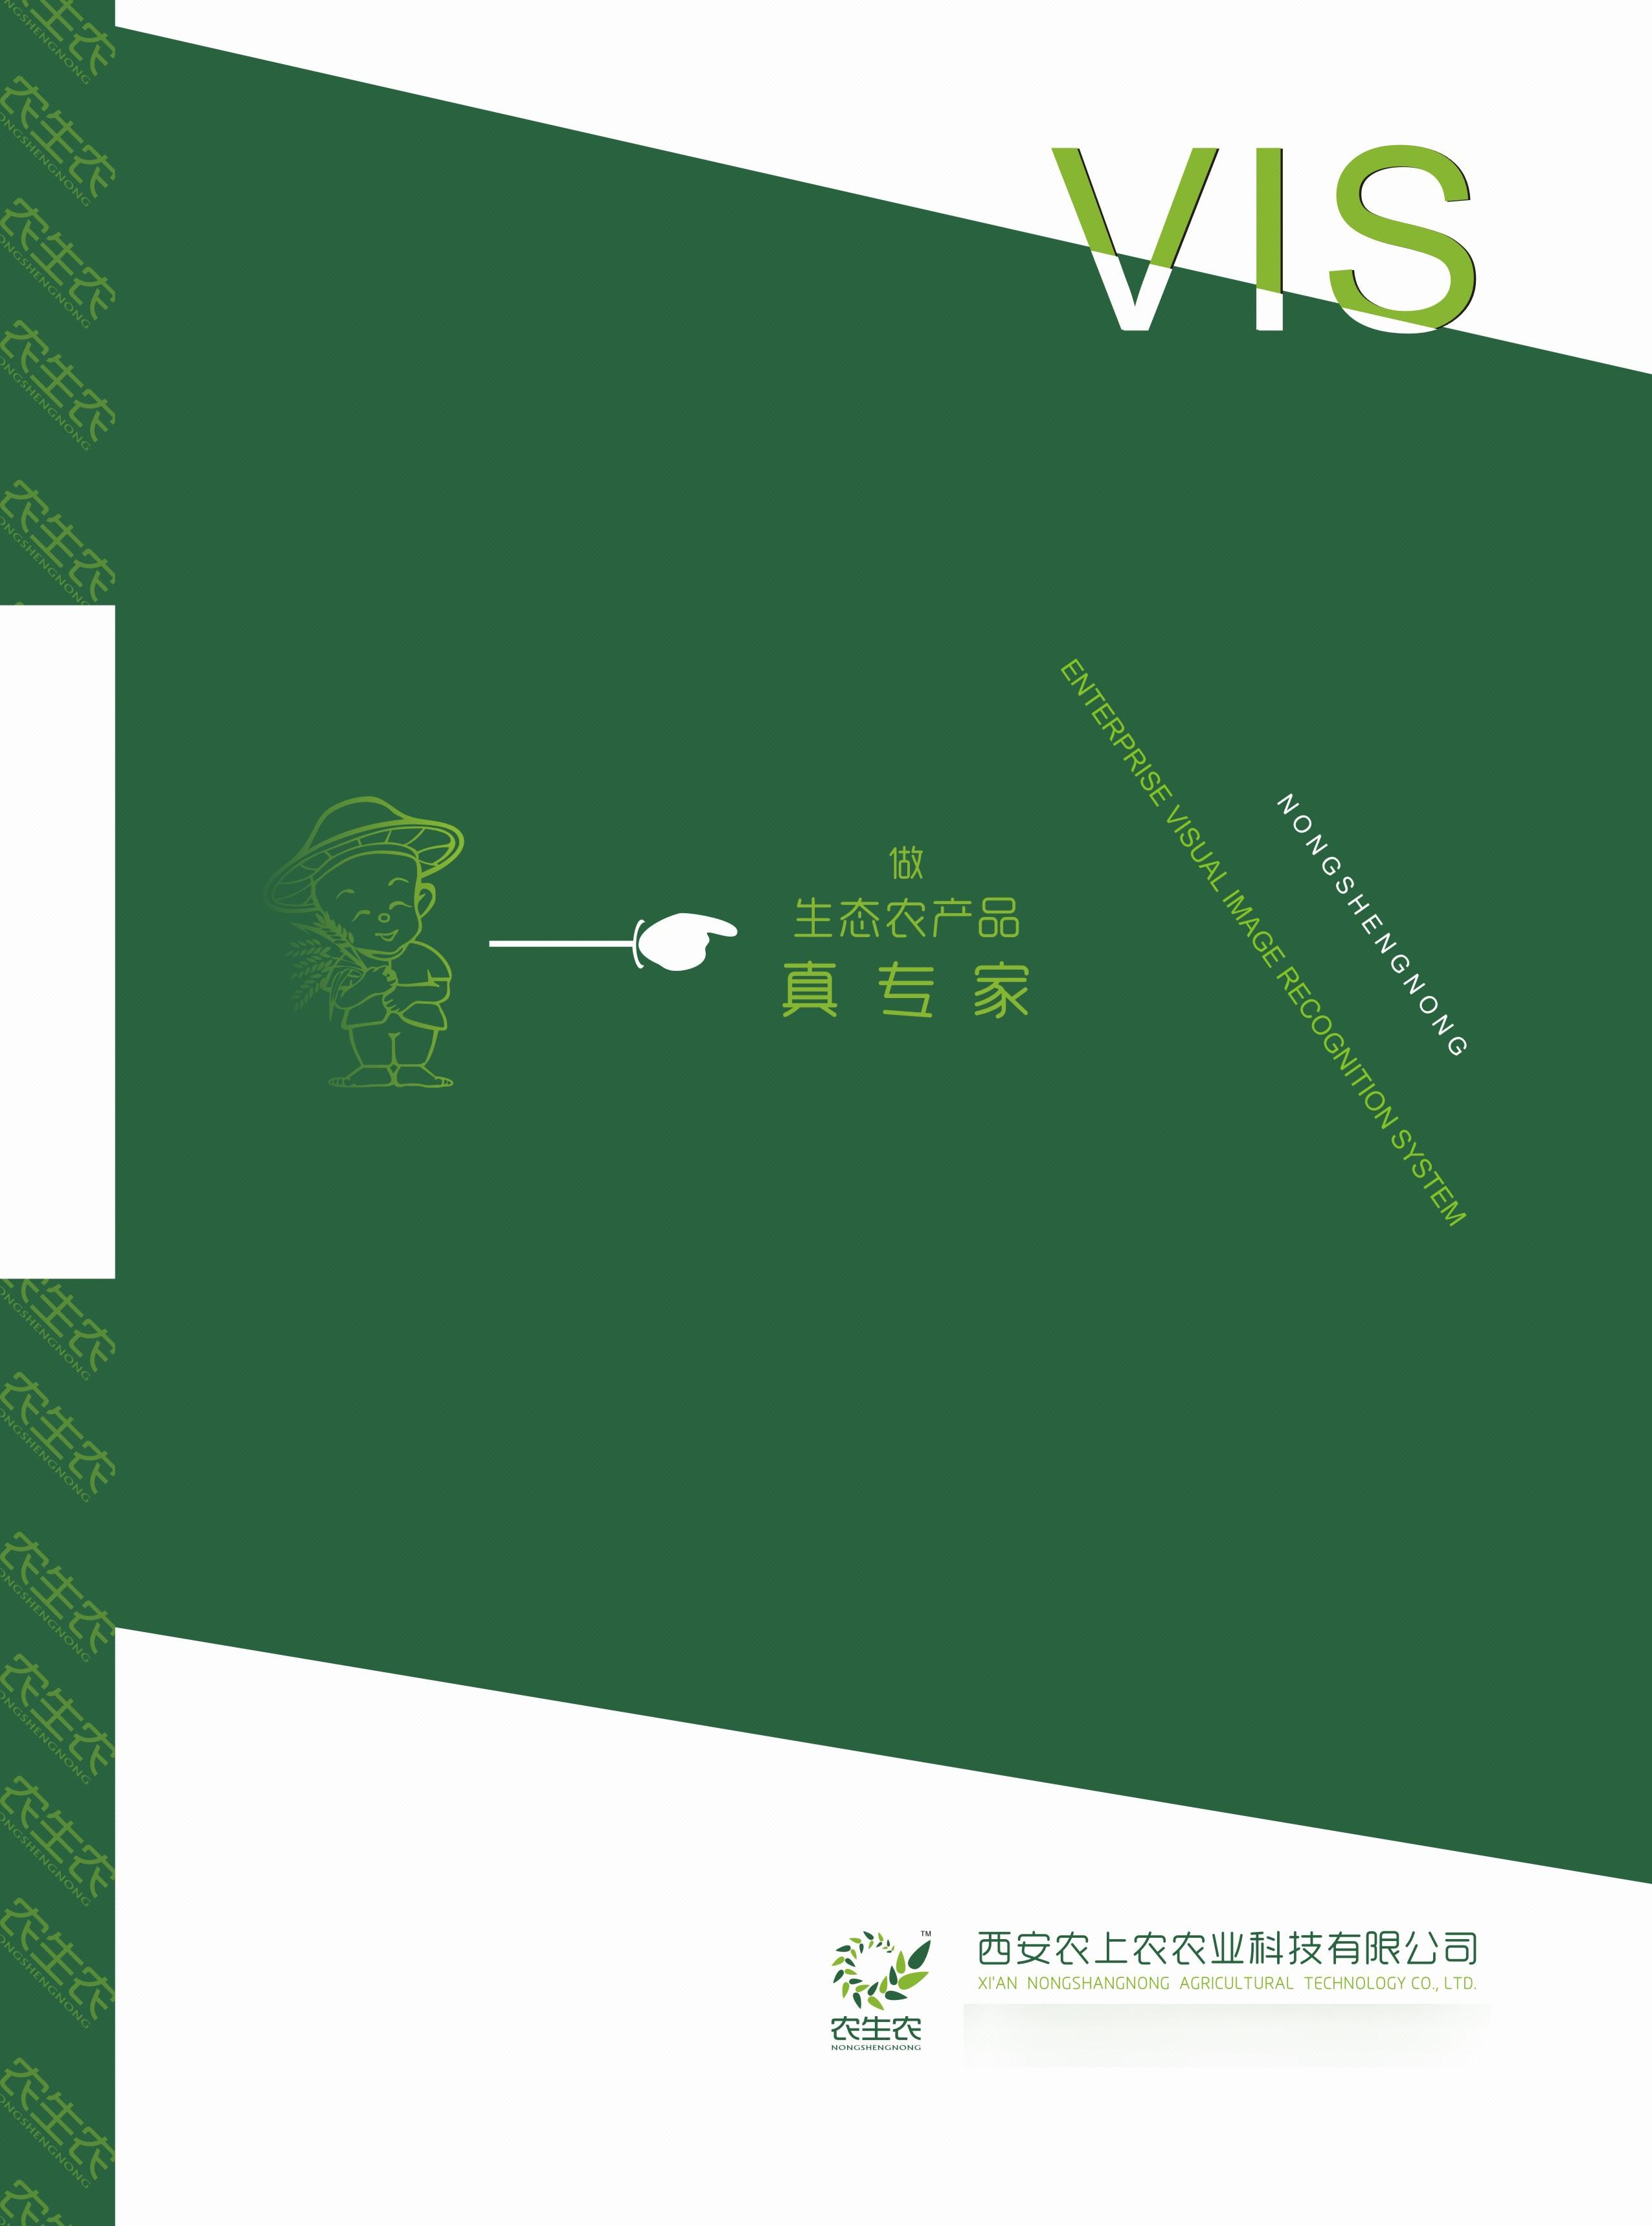 logo vis 吉祥物设计 农业 餐饮 服饰 电商 教育